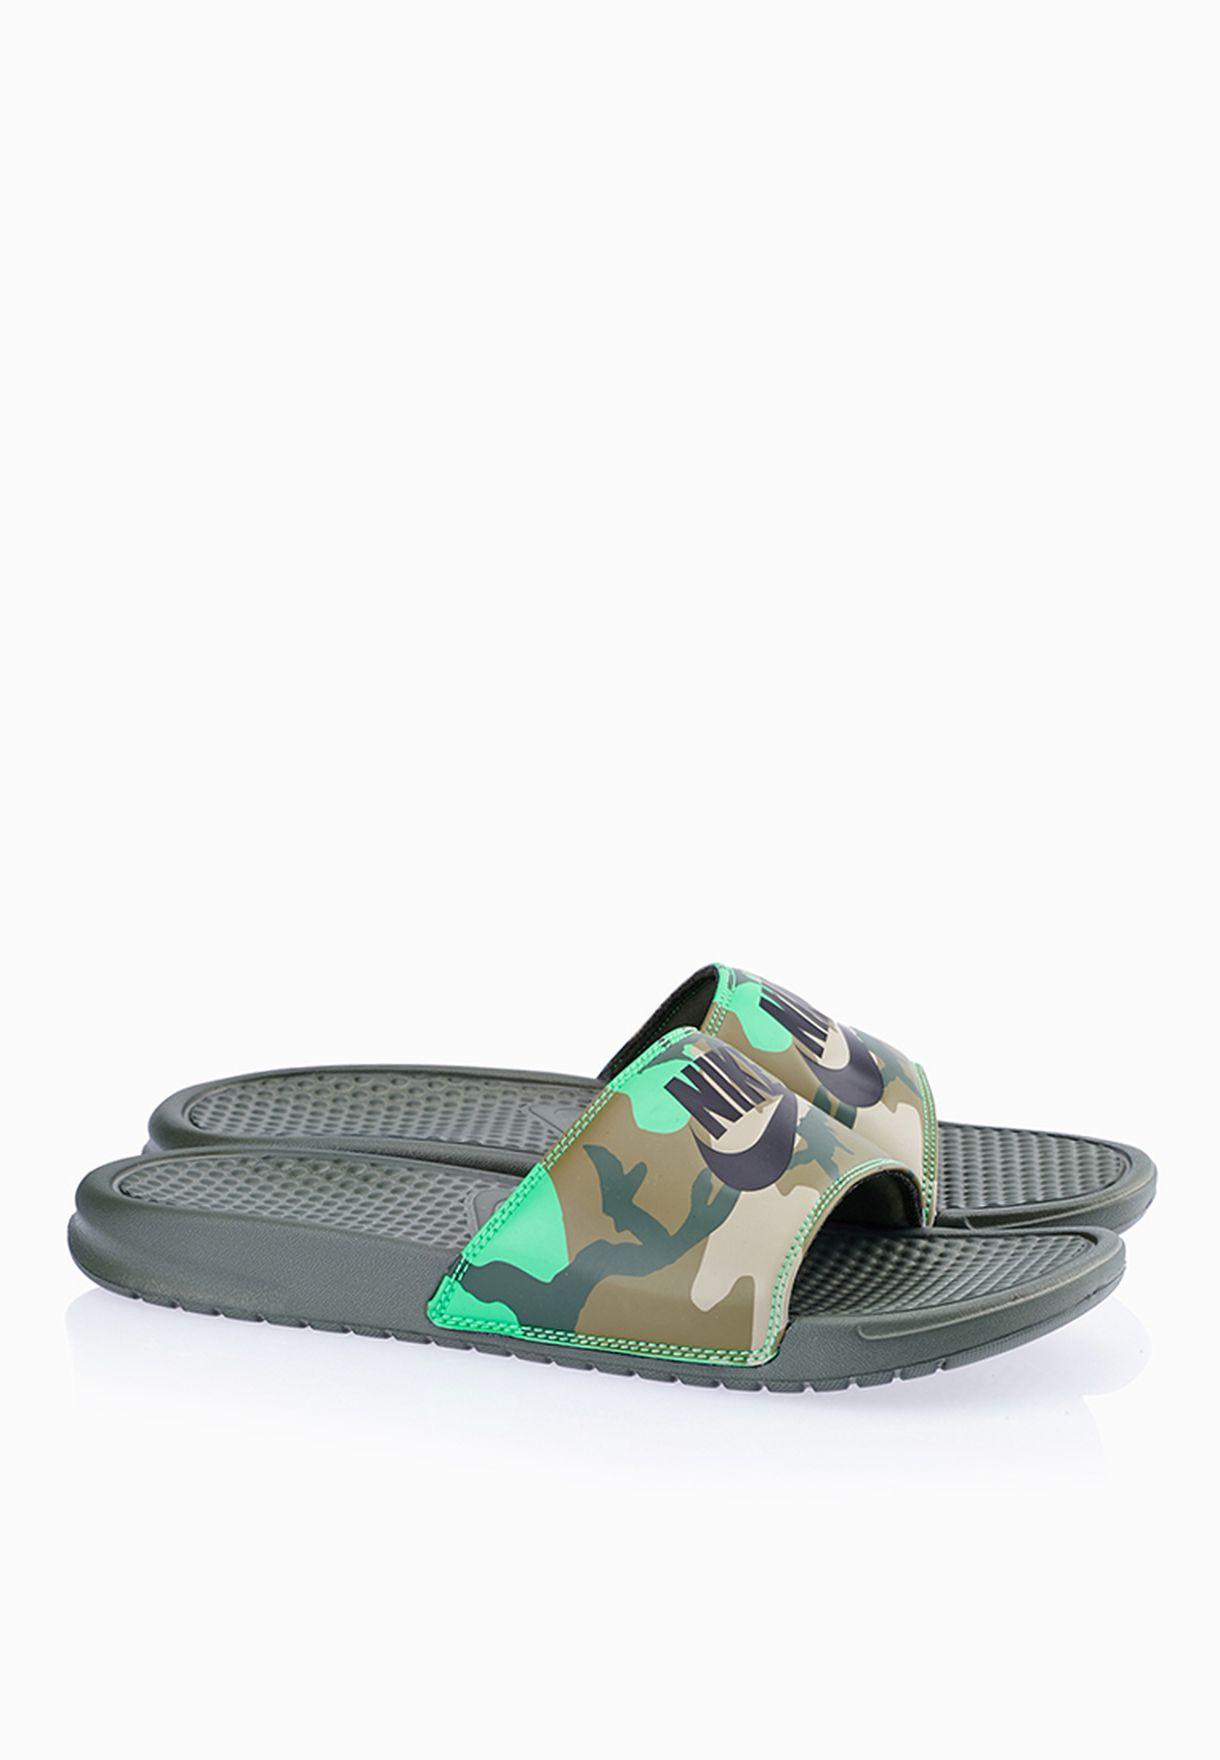 bad3dd05c28f Shop Nike prints Benassi JDI Print 631261-323 for Men in Saudi -  NI727SH03FHC